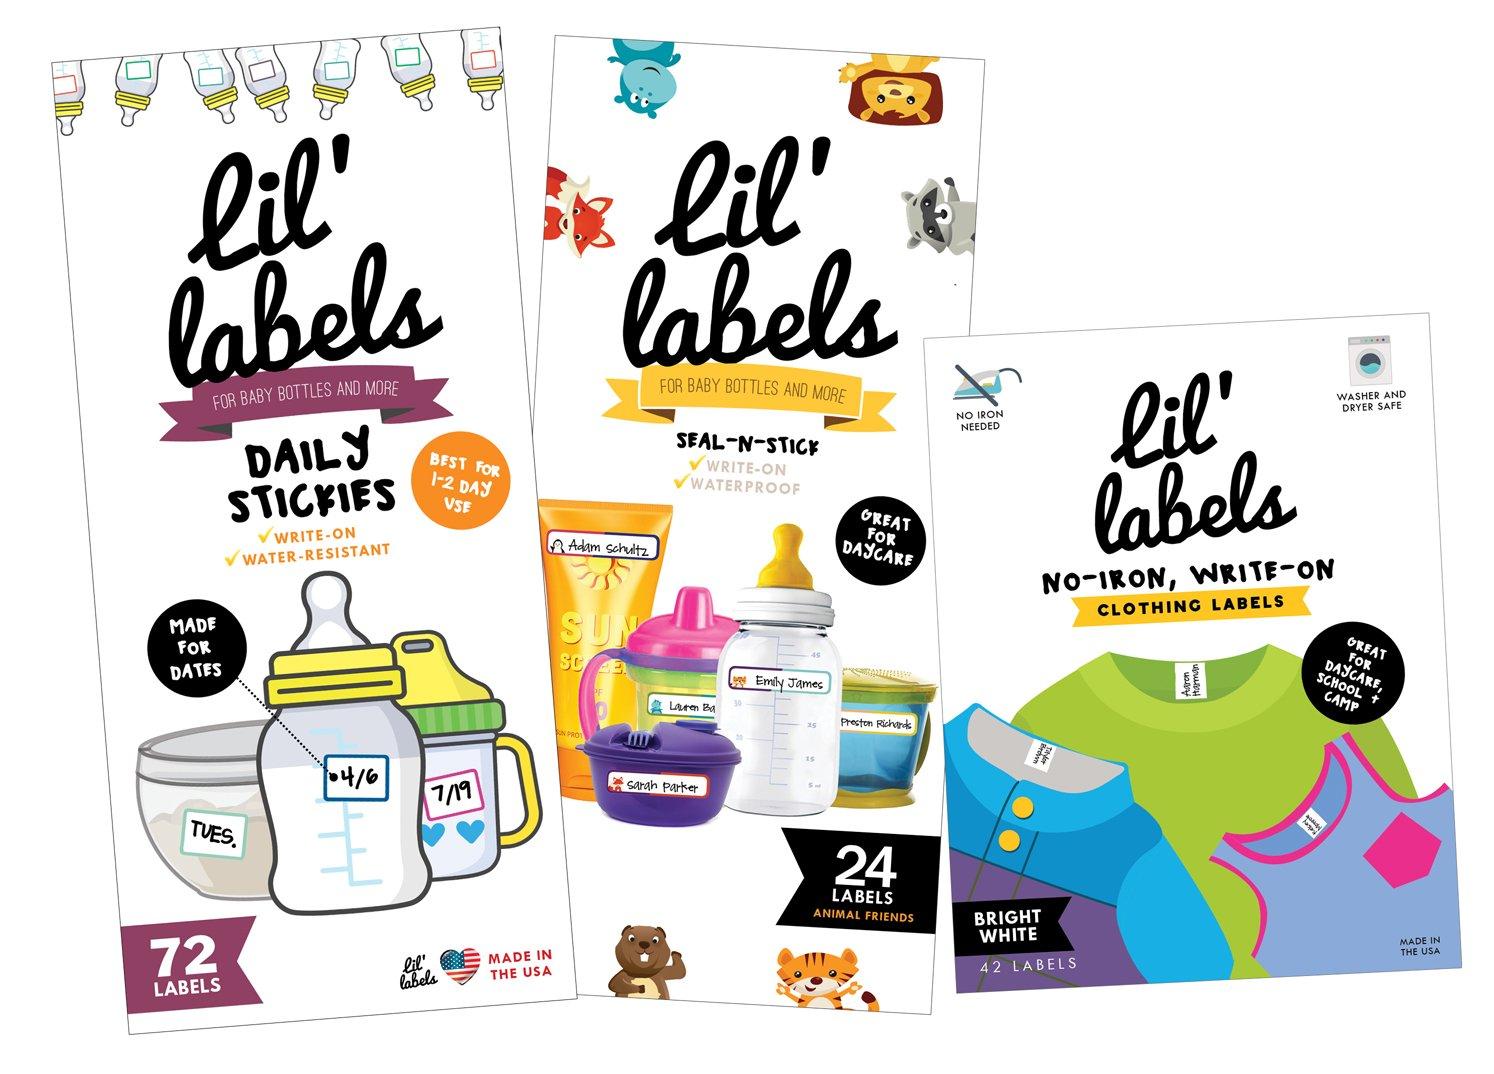 Daycare MEGA Pack - Write On Kids Name Labels, Waterproof (Animal Baby Bottle Labels/Plain Clothing Labels/Date Labels)